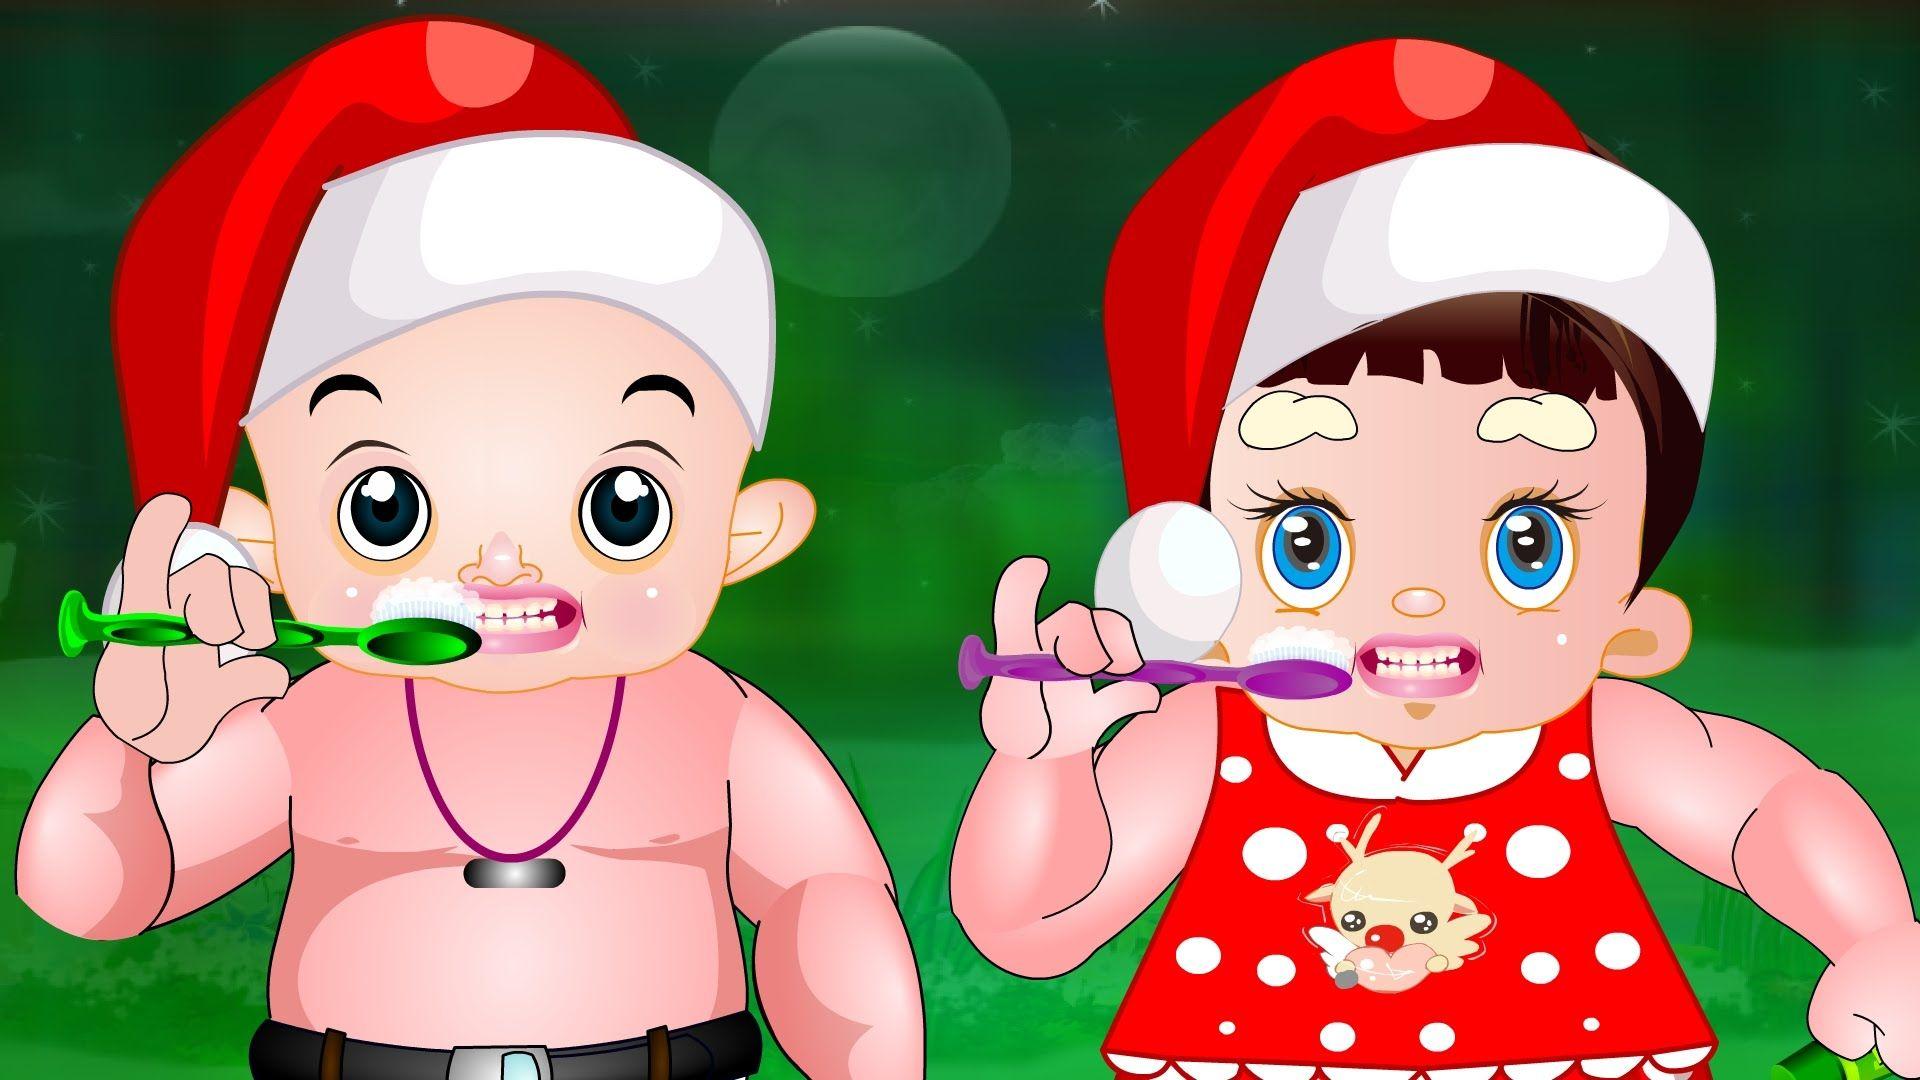 Brush Your Teeth Nursery Rhyme The Good Habits Song Kids